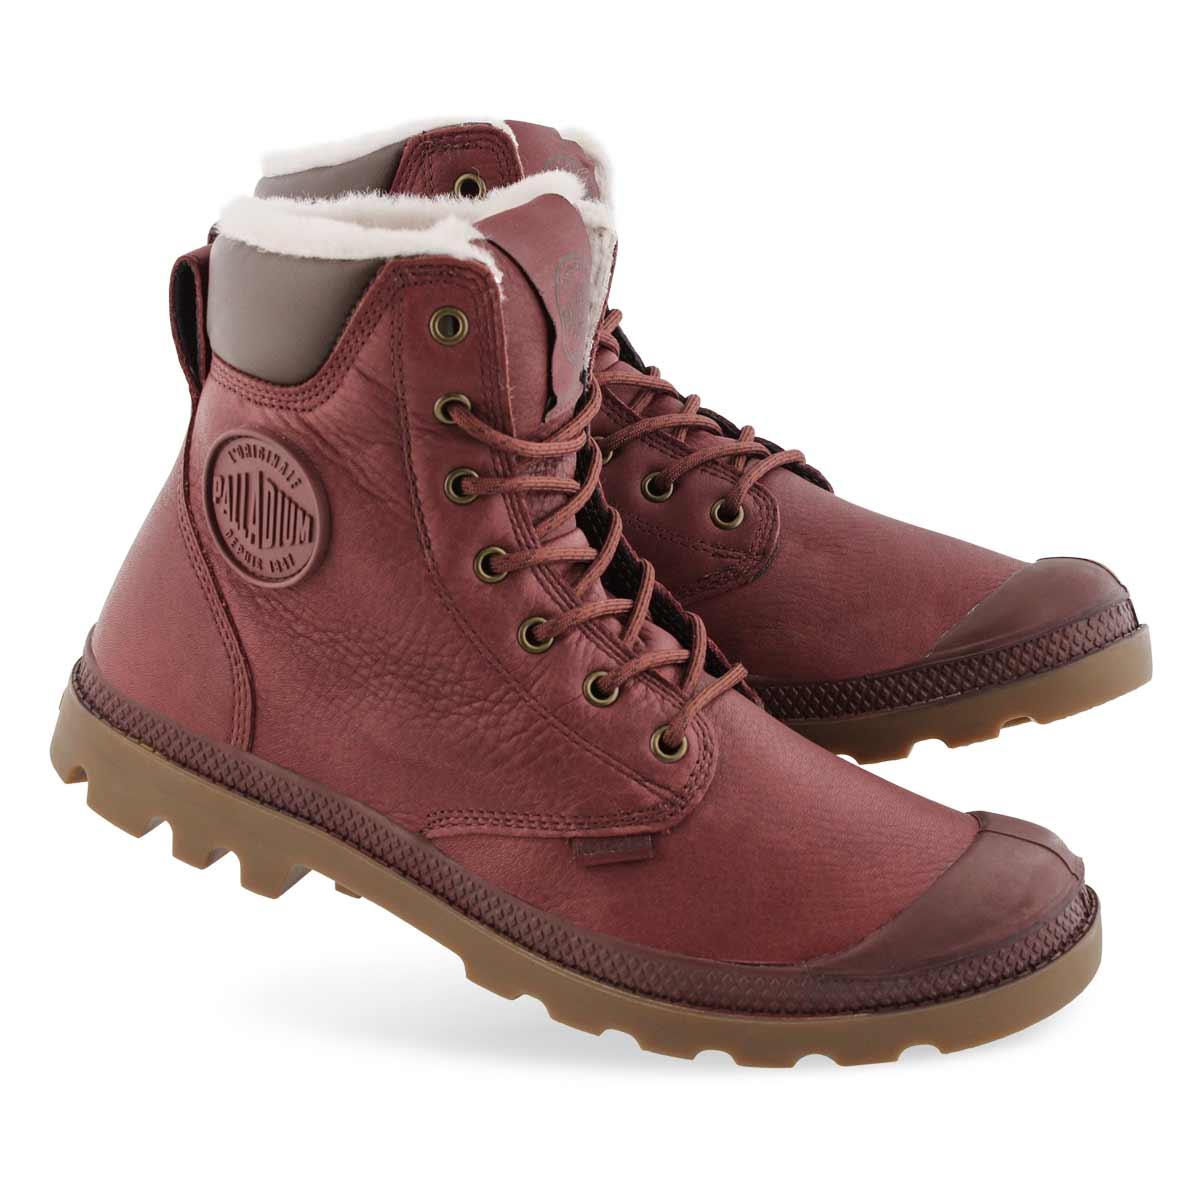 Mns PampaSportCuff ochre wp lined boot